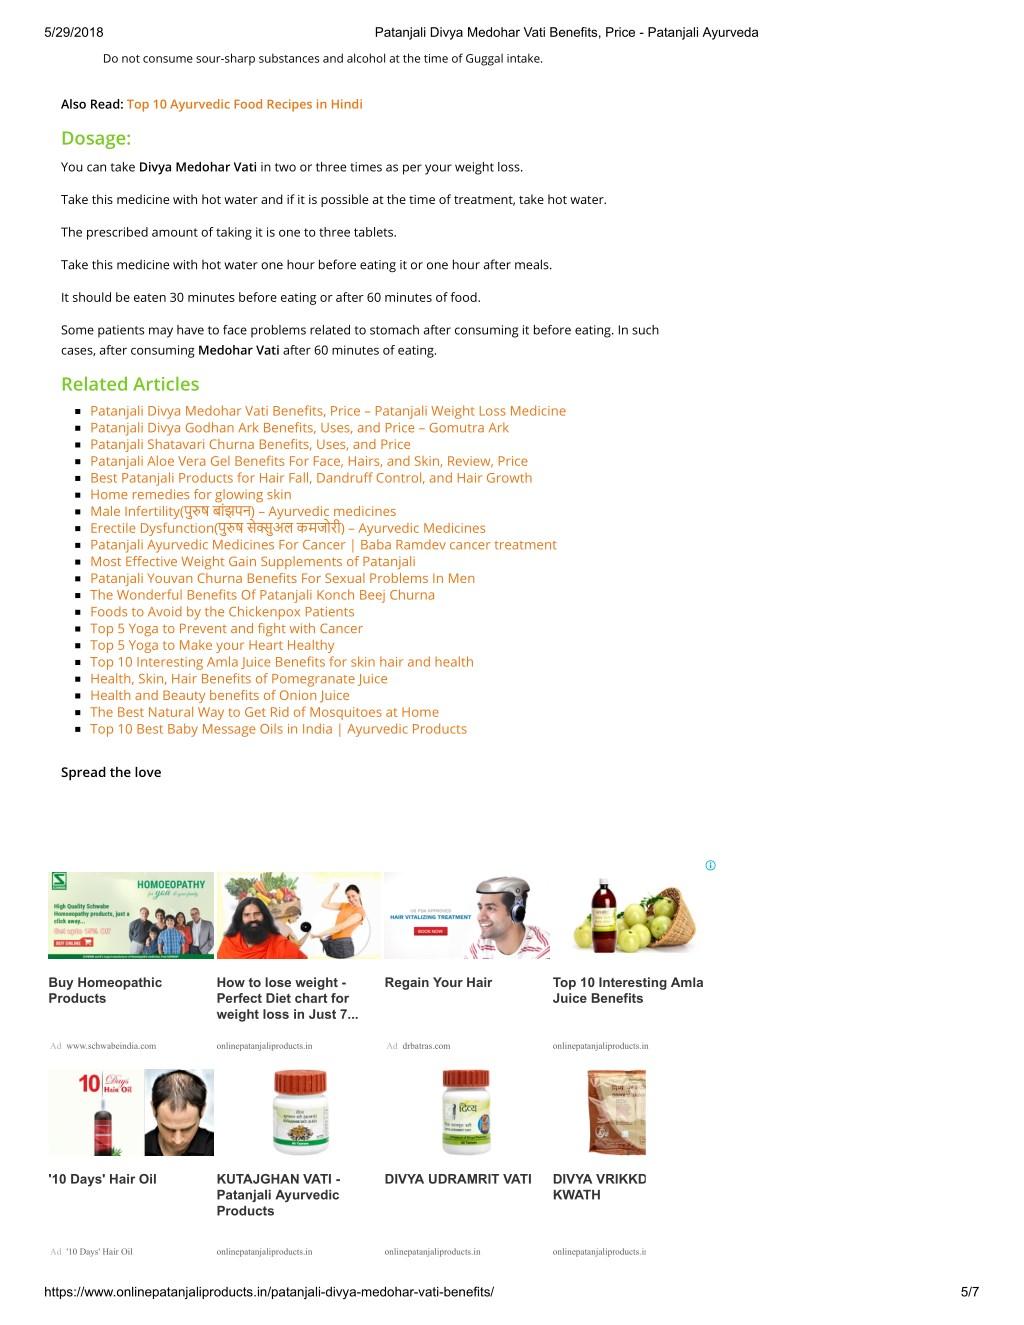 PPT - Patanjali Divya Medohar Vati Benefits and Price PowerPoint